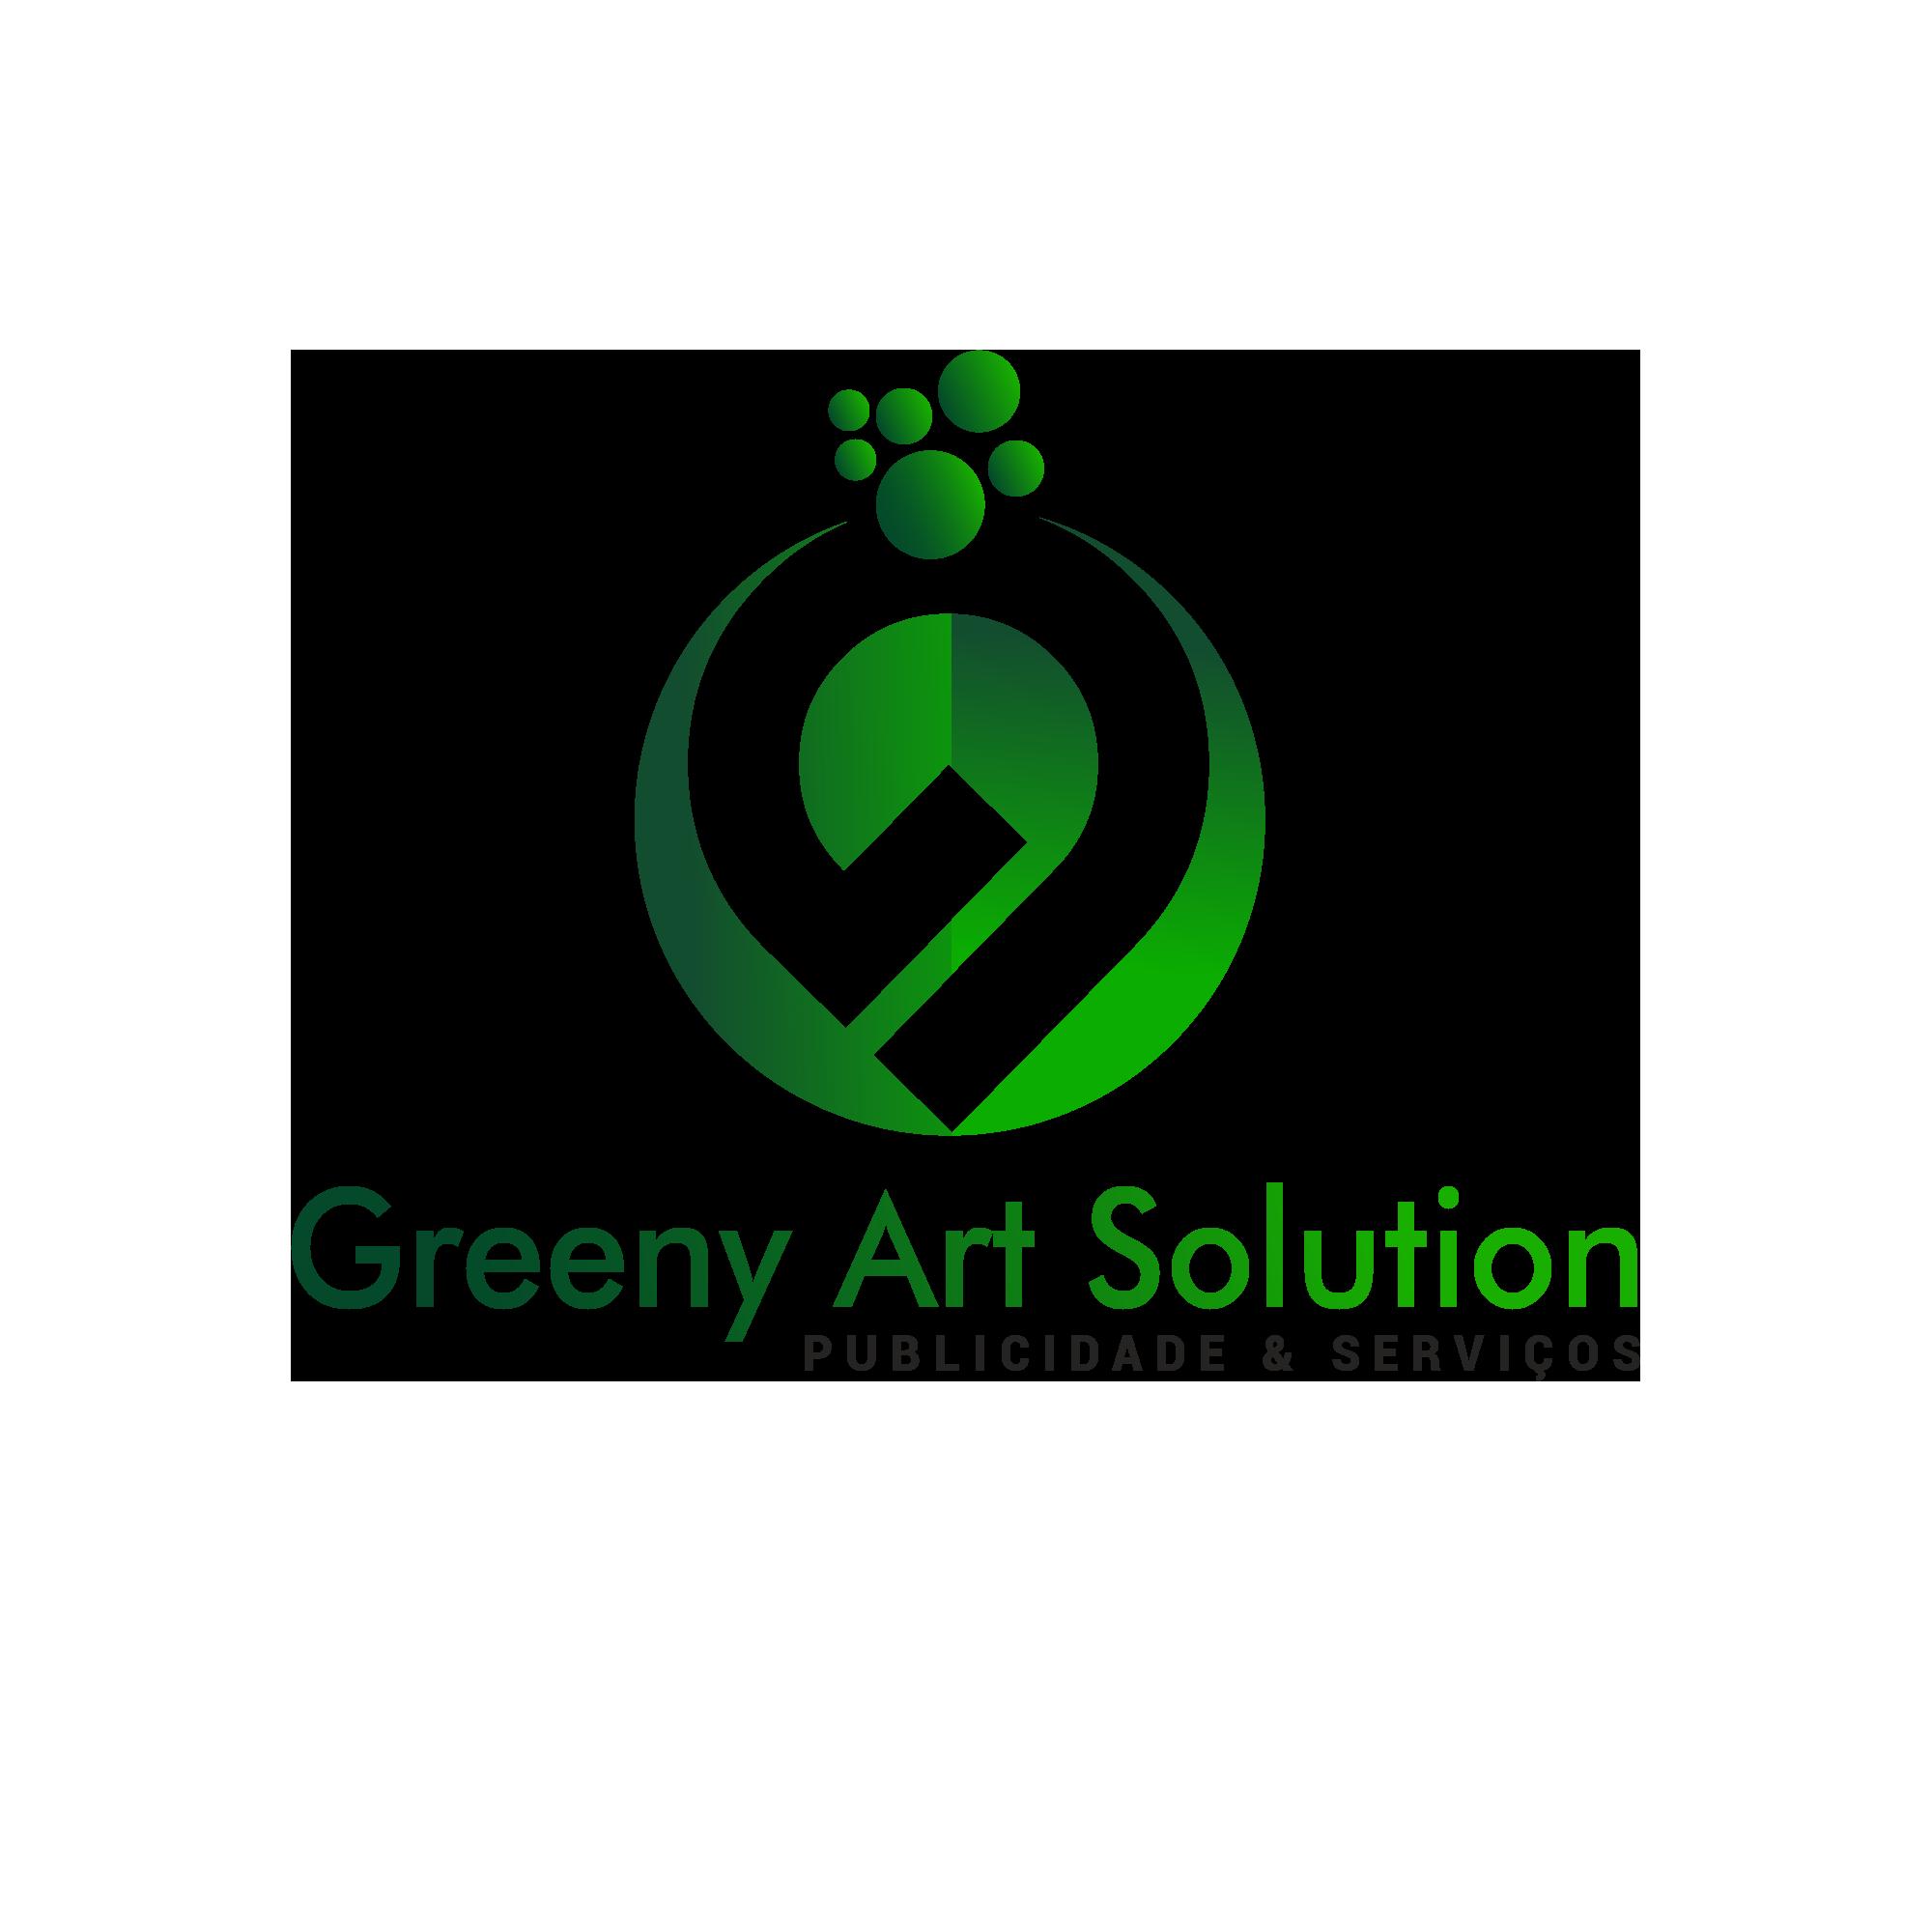 logotipo da Greeny Art Solution